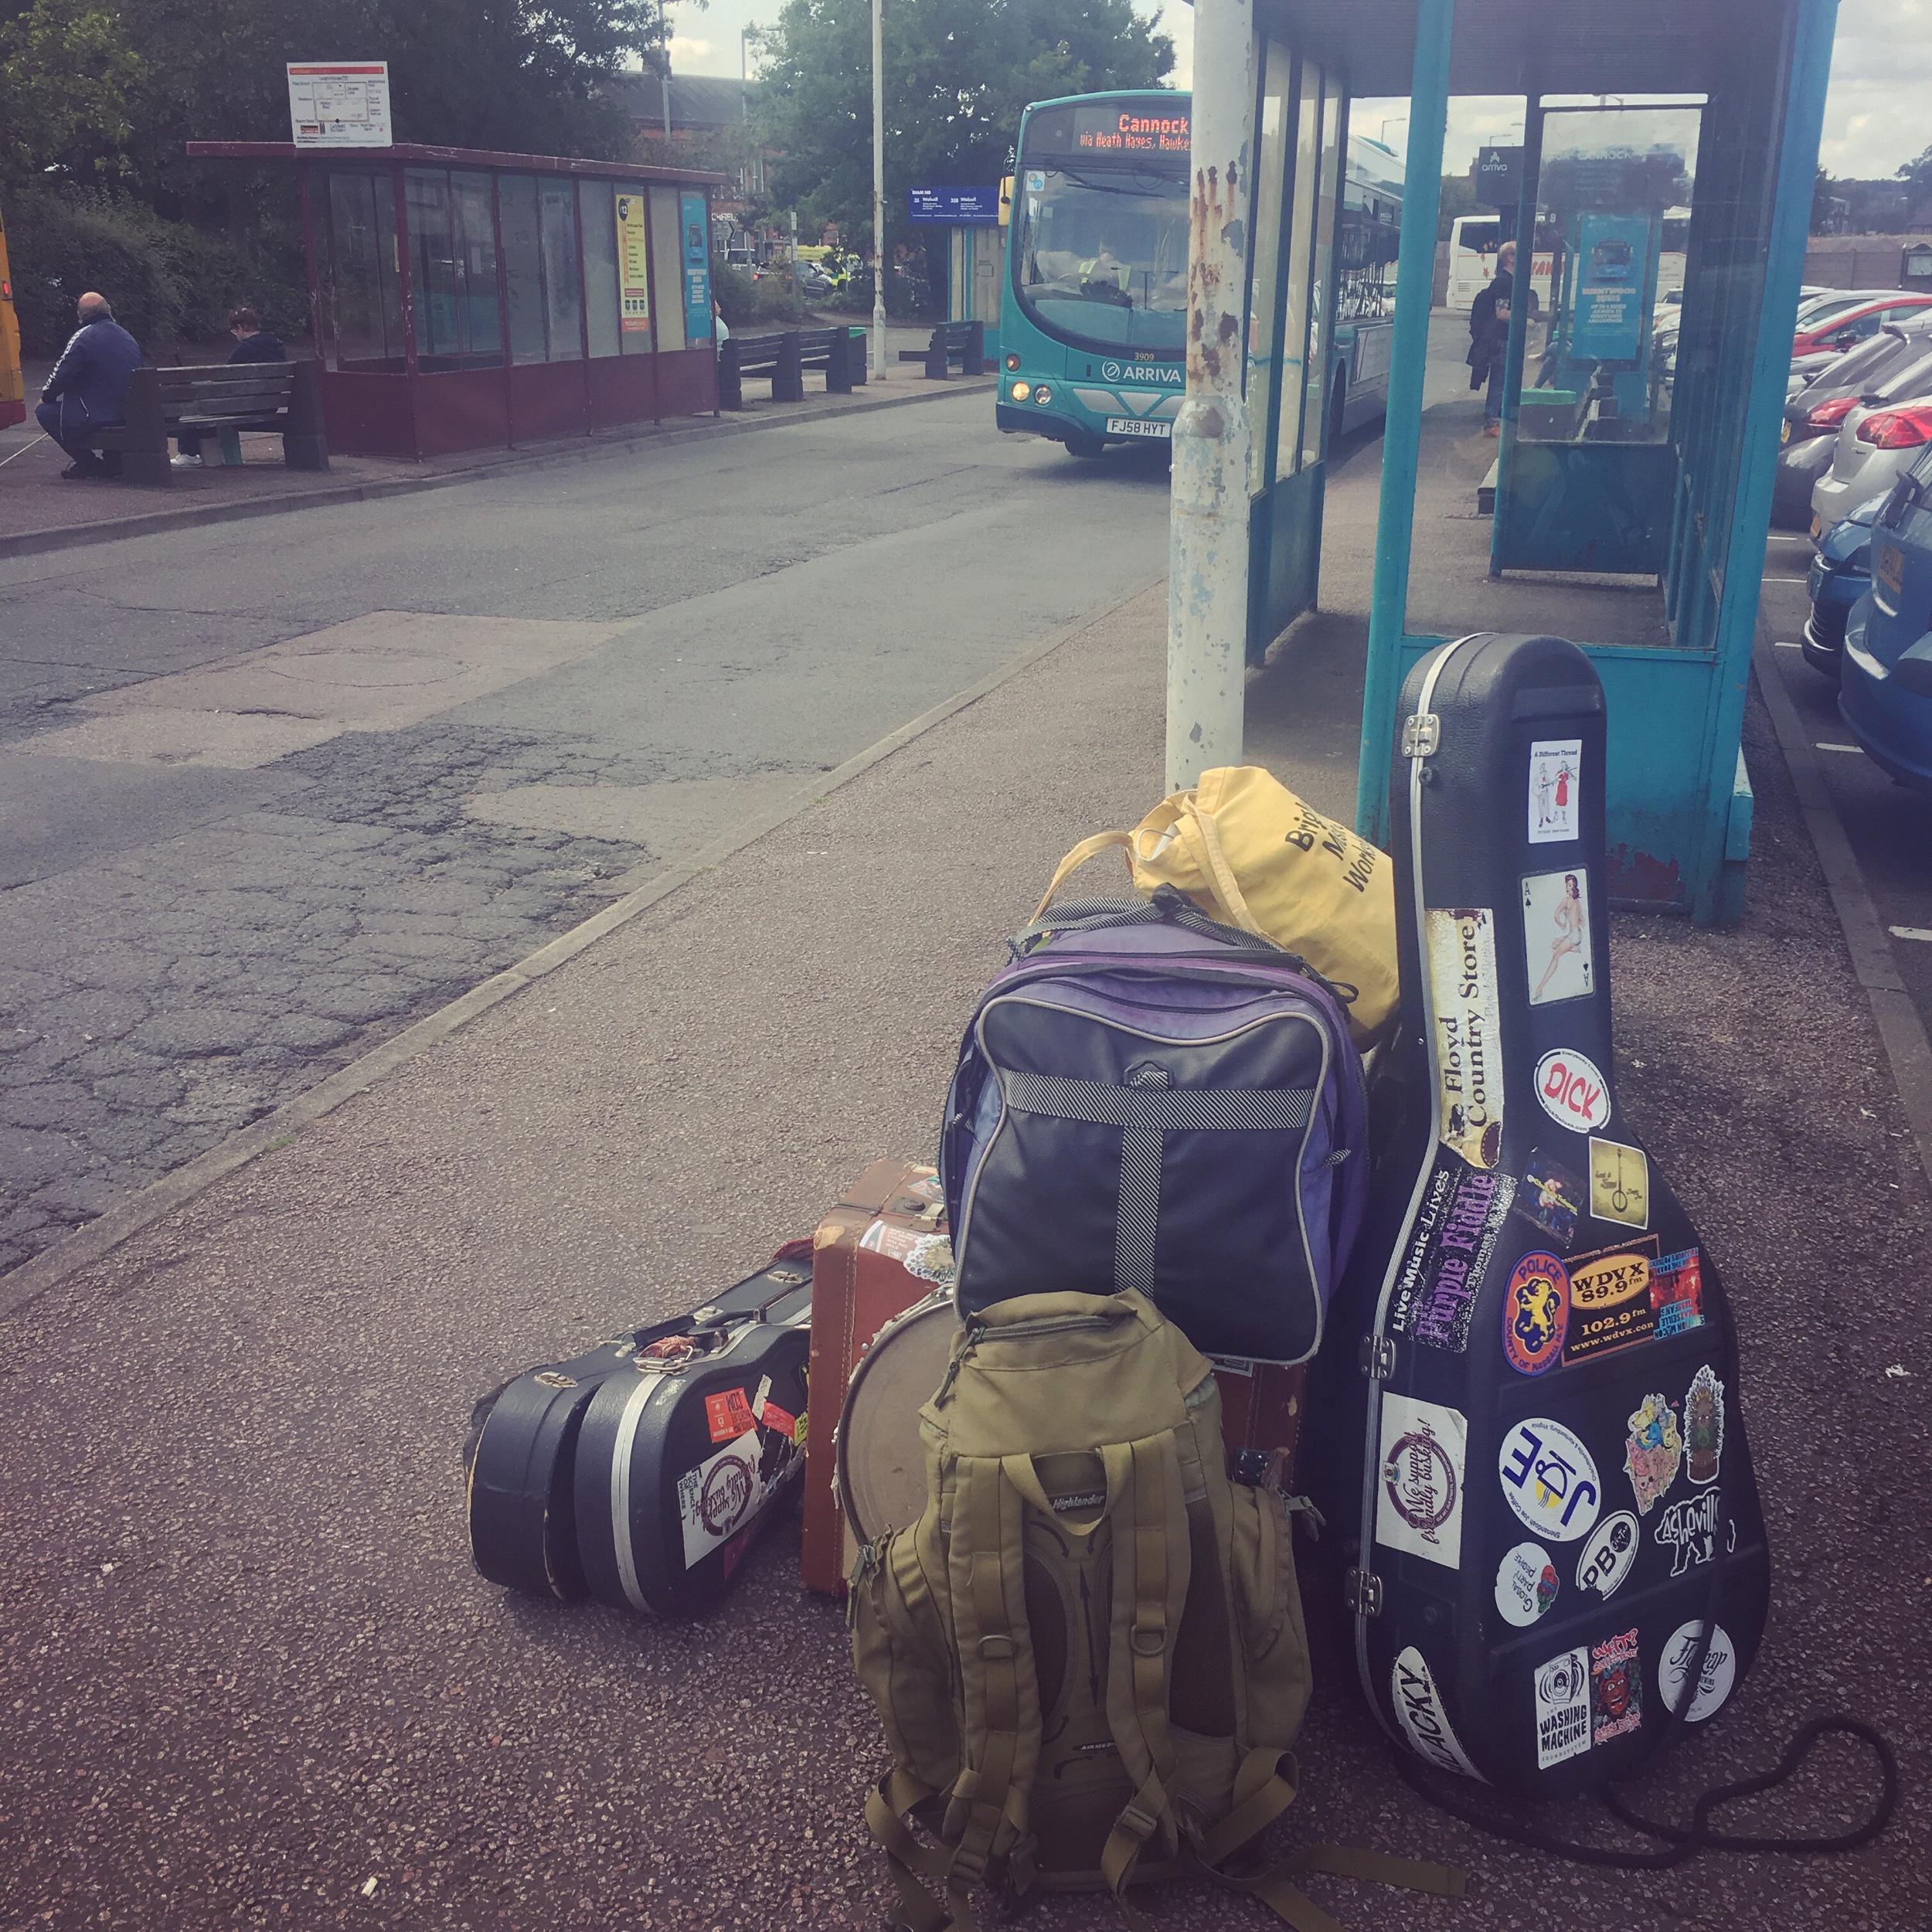 Leaving Lichfield Bus Station